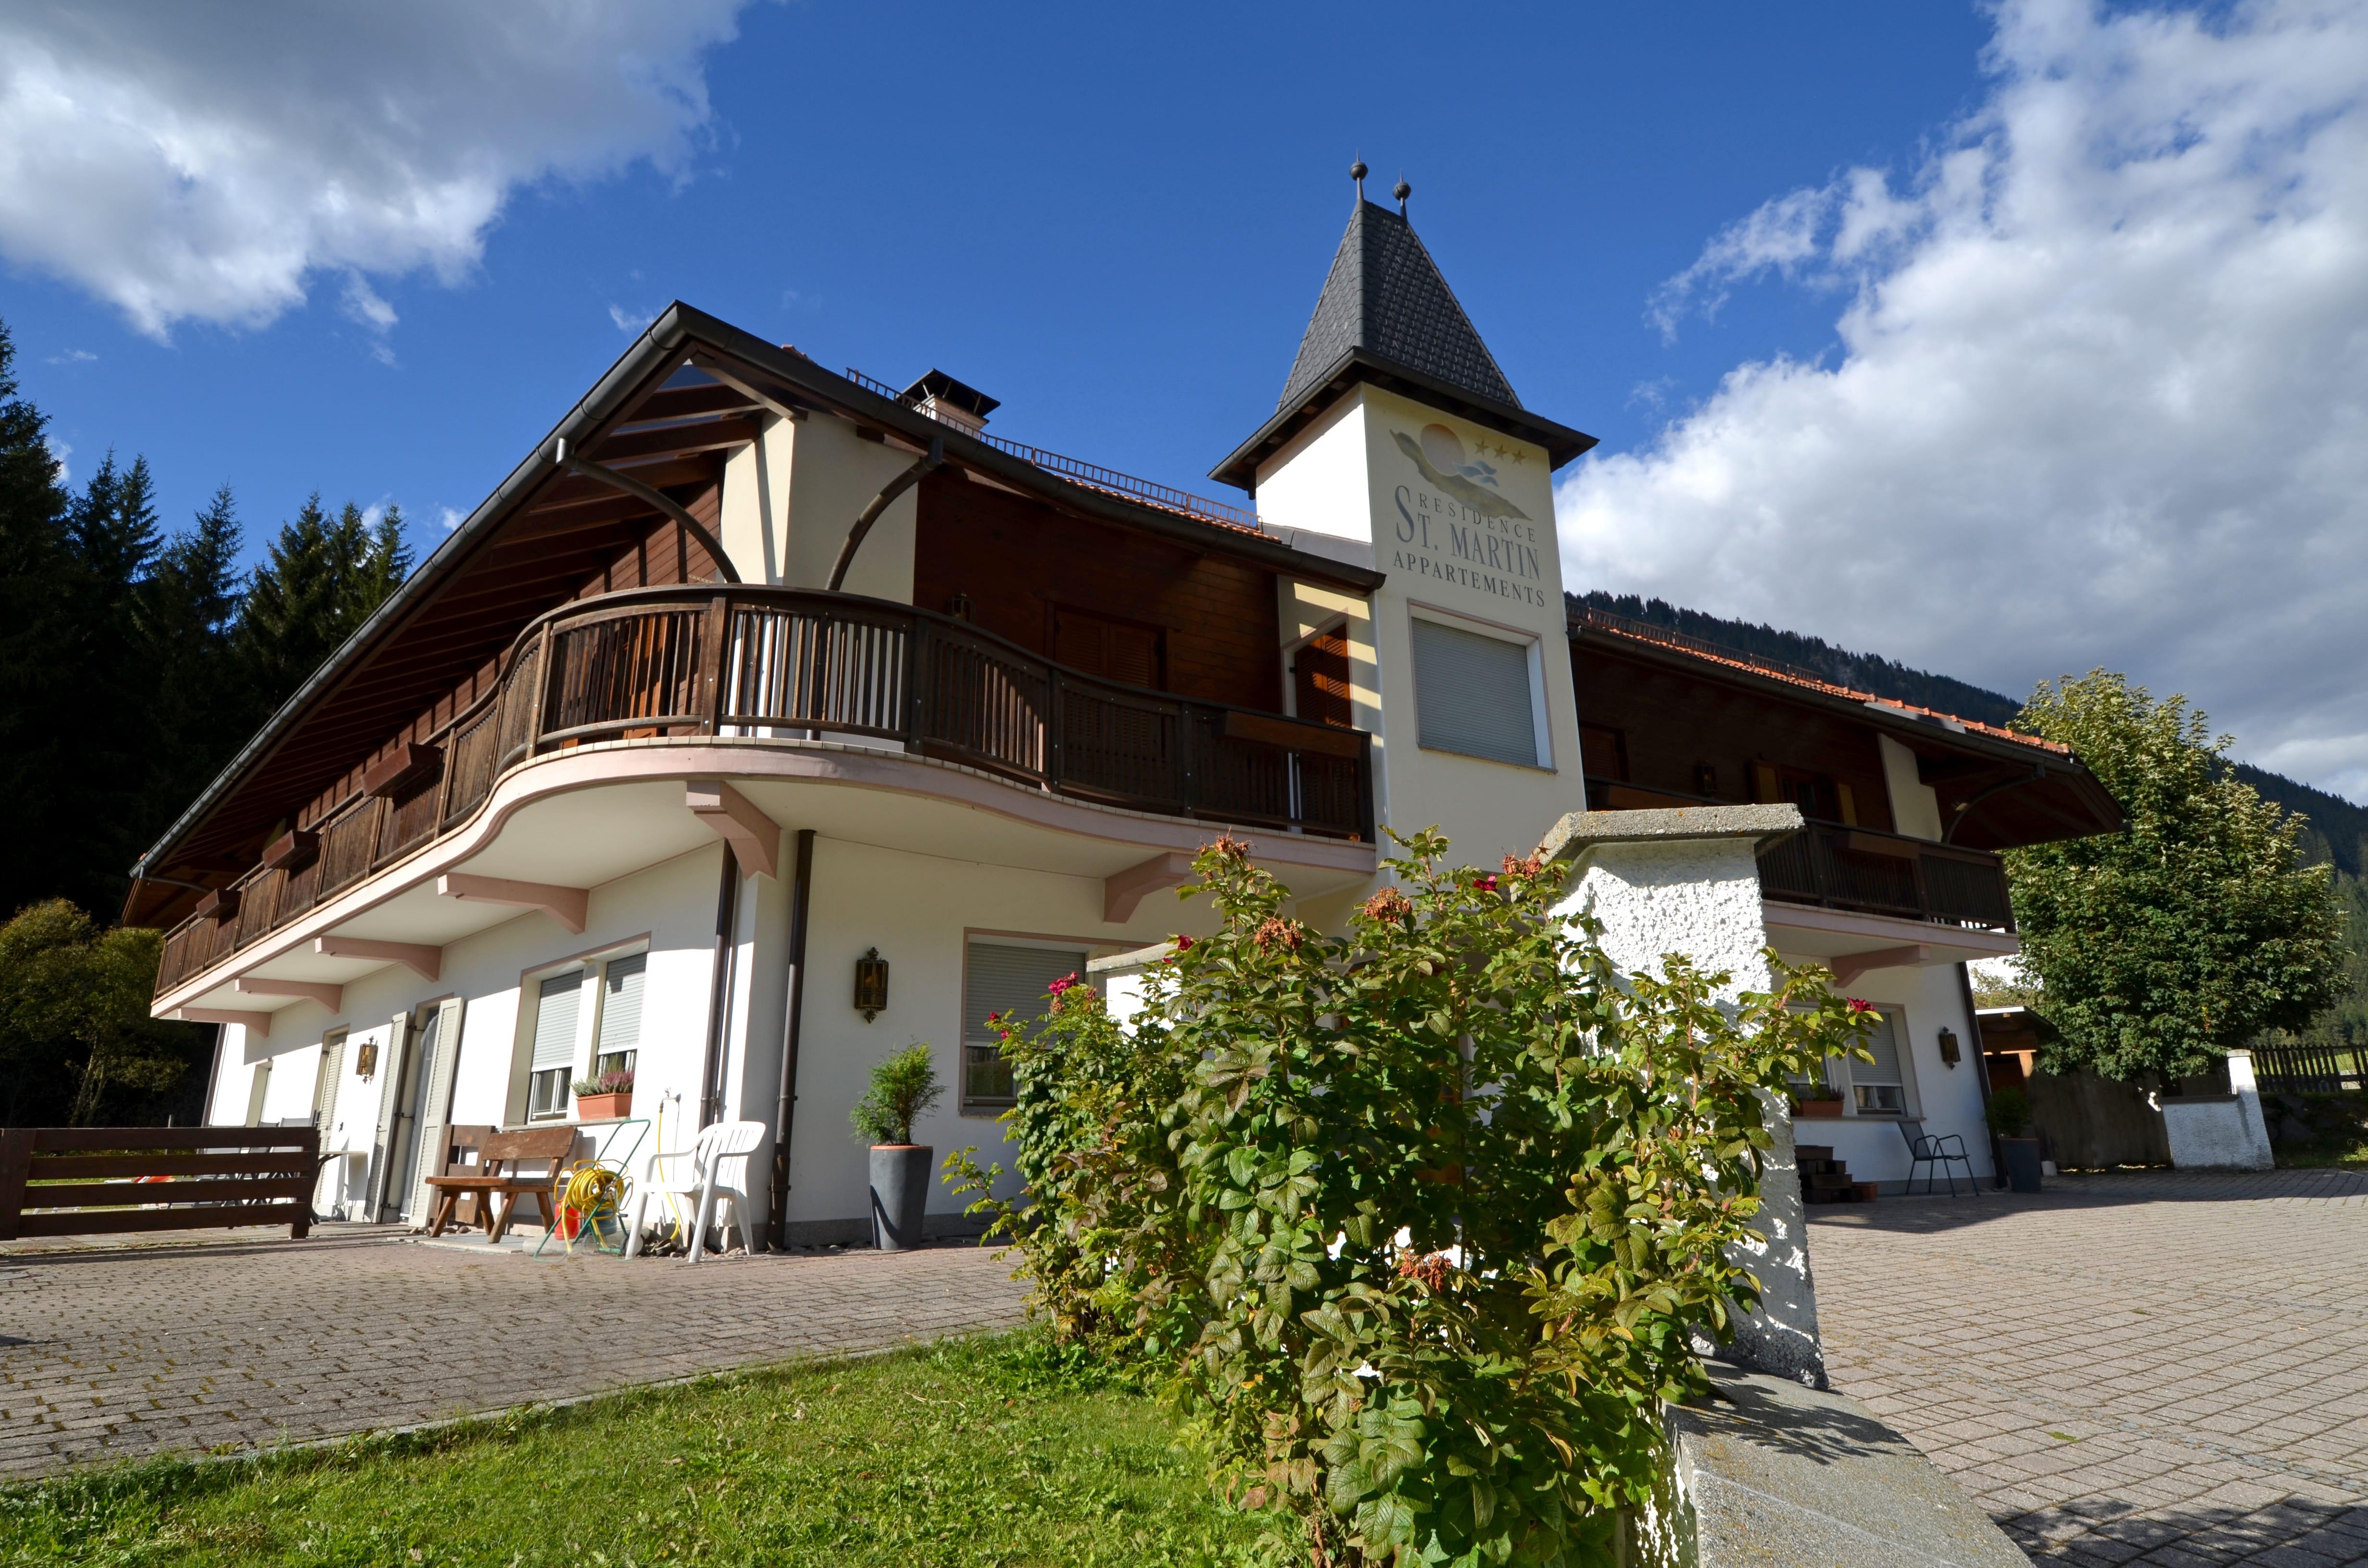 Itálie - Kronplatz / Plan de Corones - Residence St. Martin